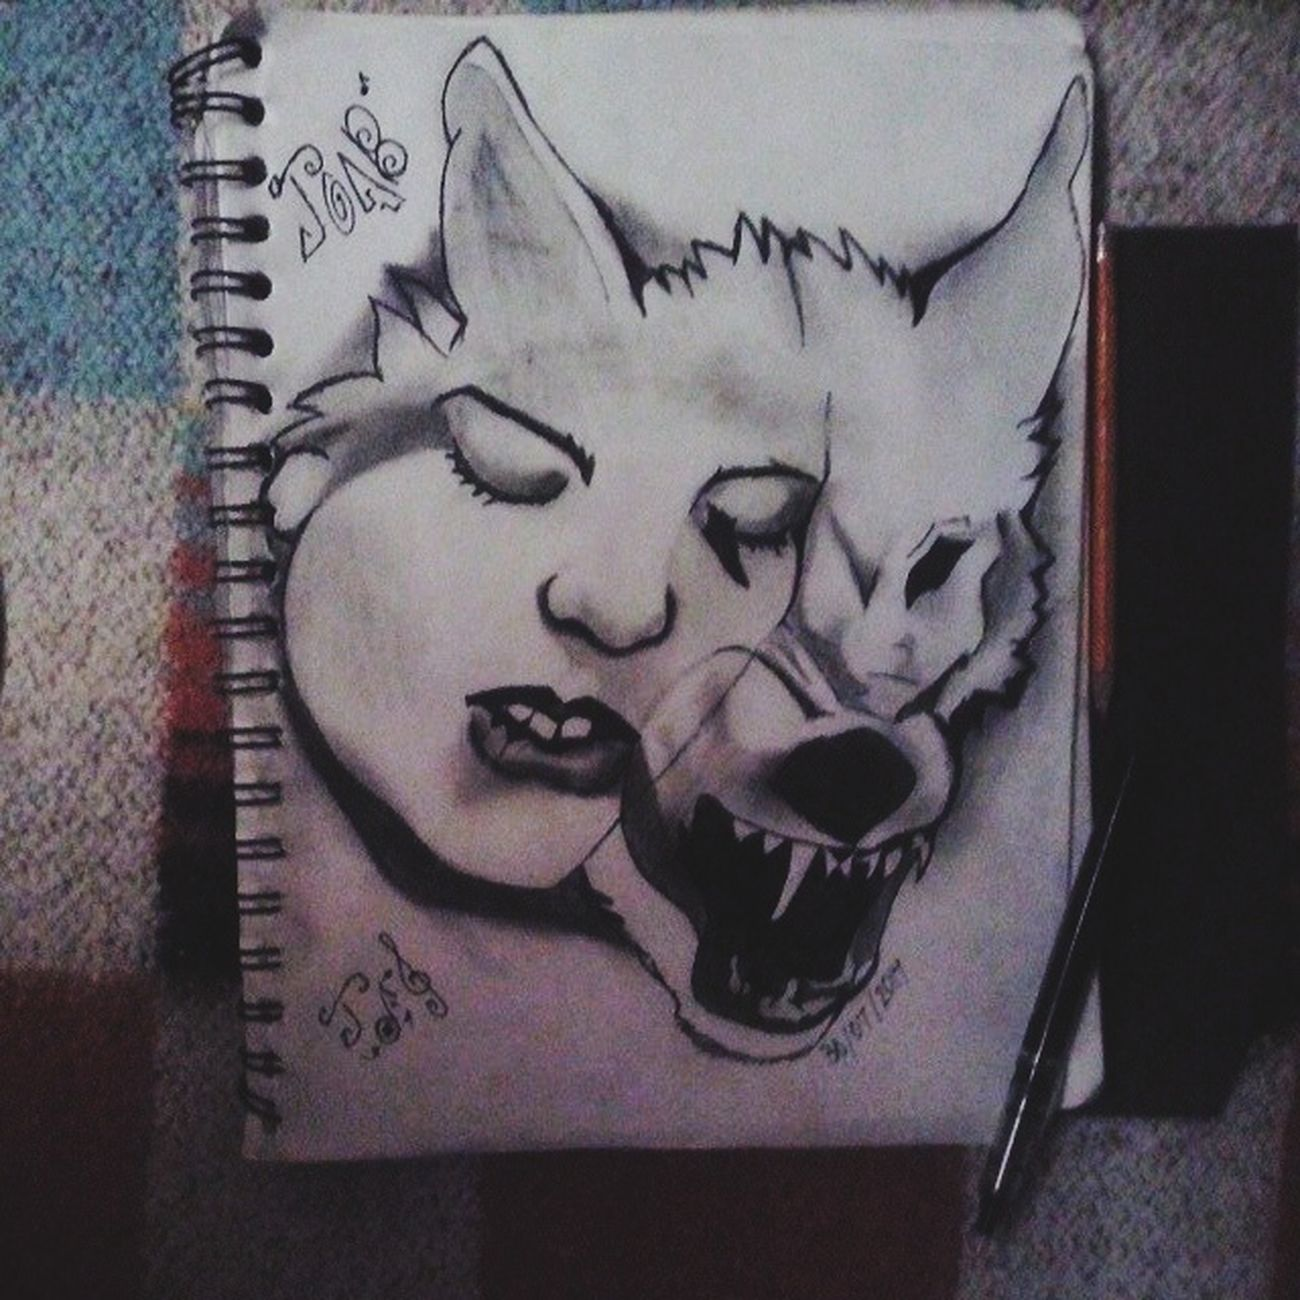 La Mente Detras Del Lapiz Teen Wolf Girl Dibujo A Lapiz Drawingtime Art, Drawing, Creativity Mis Dibujos Draw Dibujo Artistic